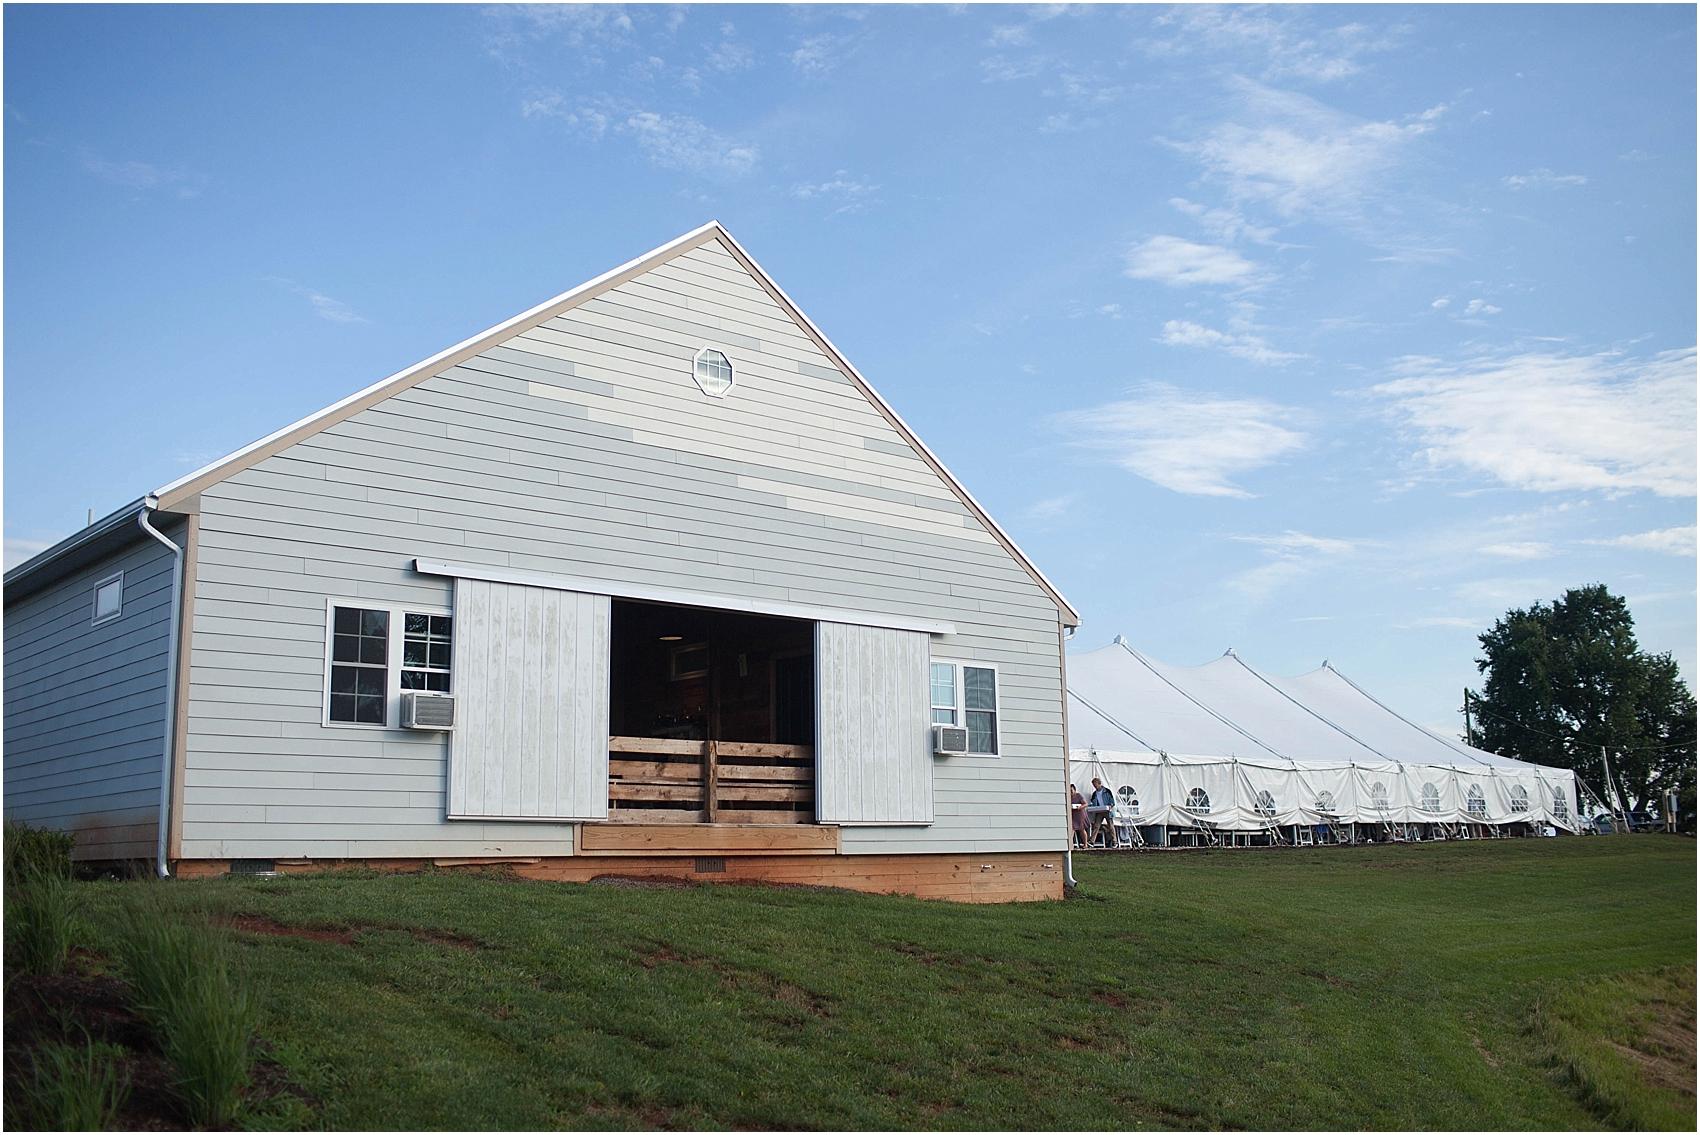 On-Sunny-Slope-Farm-Harrisonburg-Virginia-3740.jpg